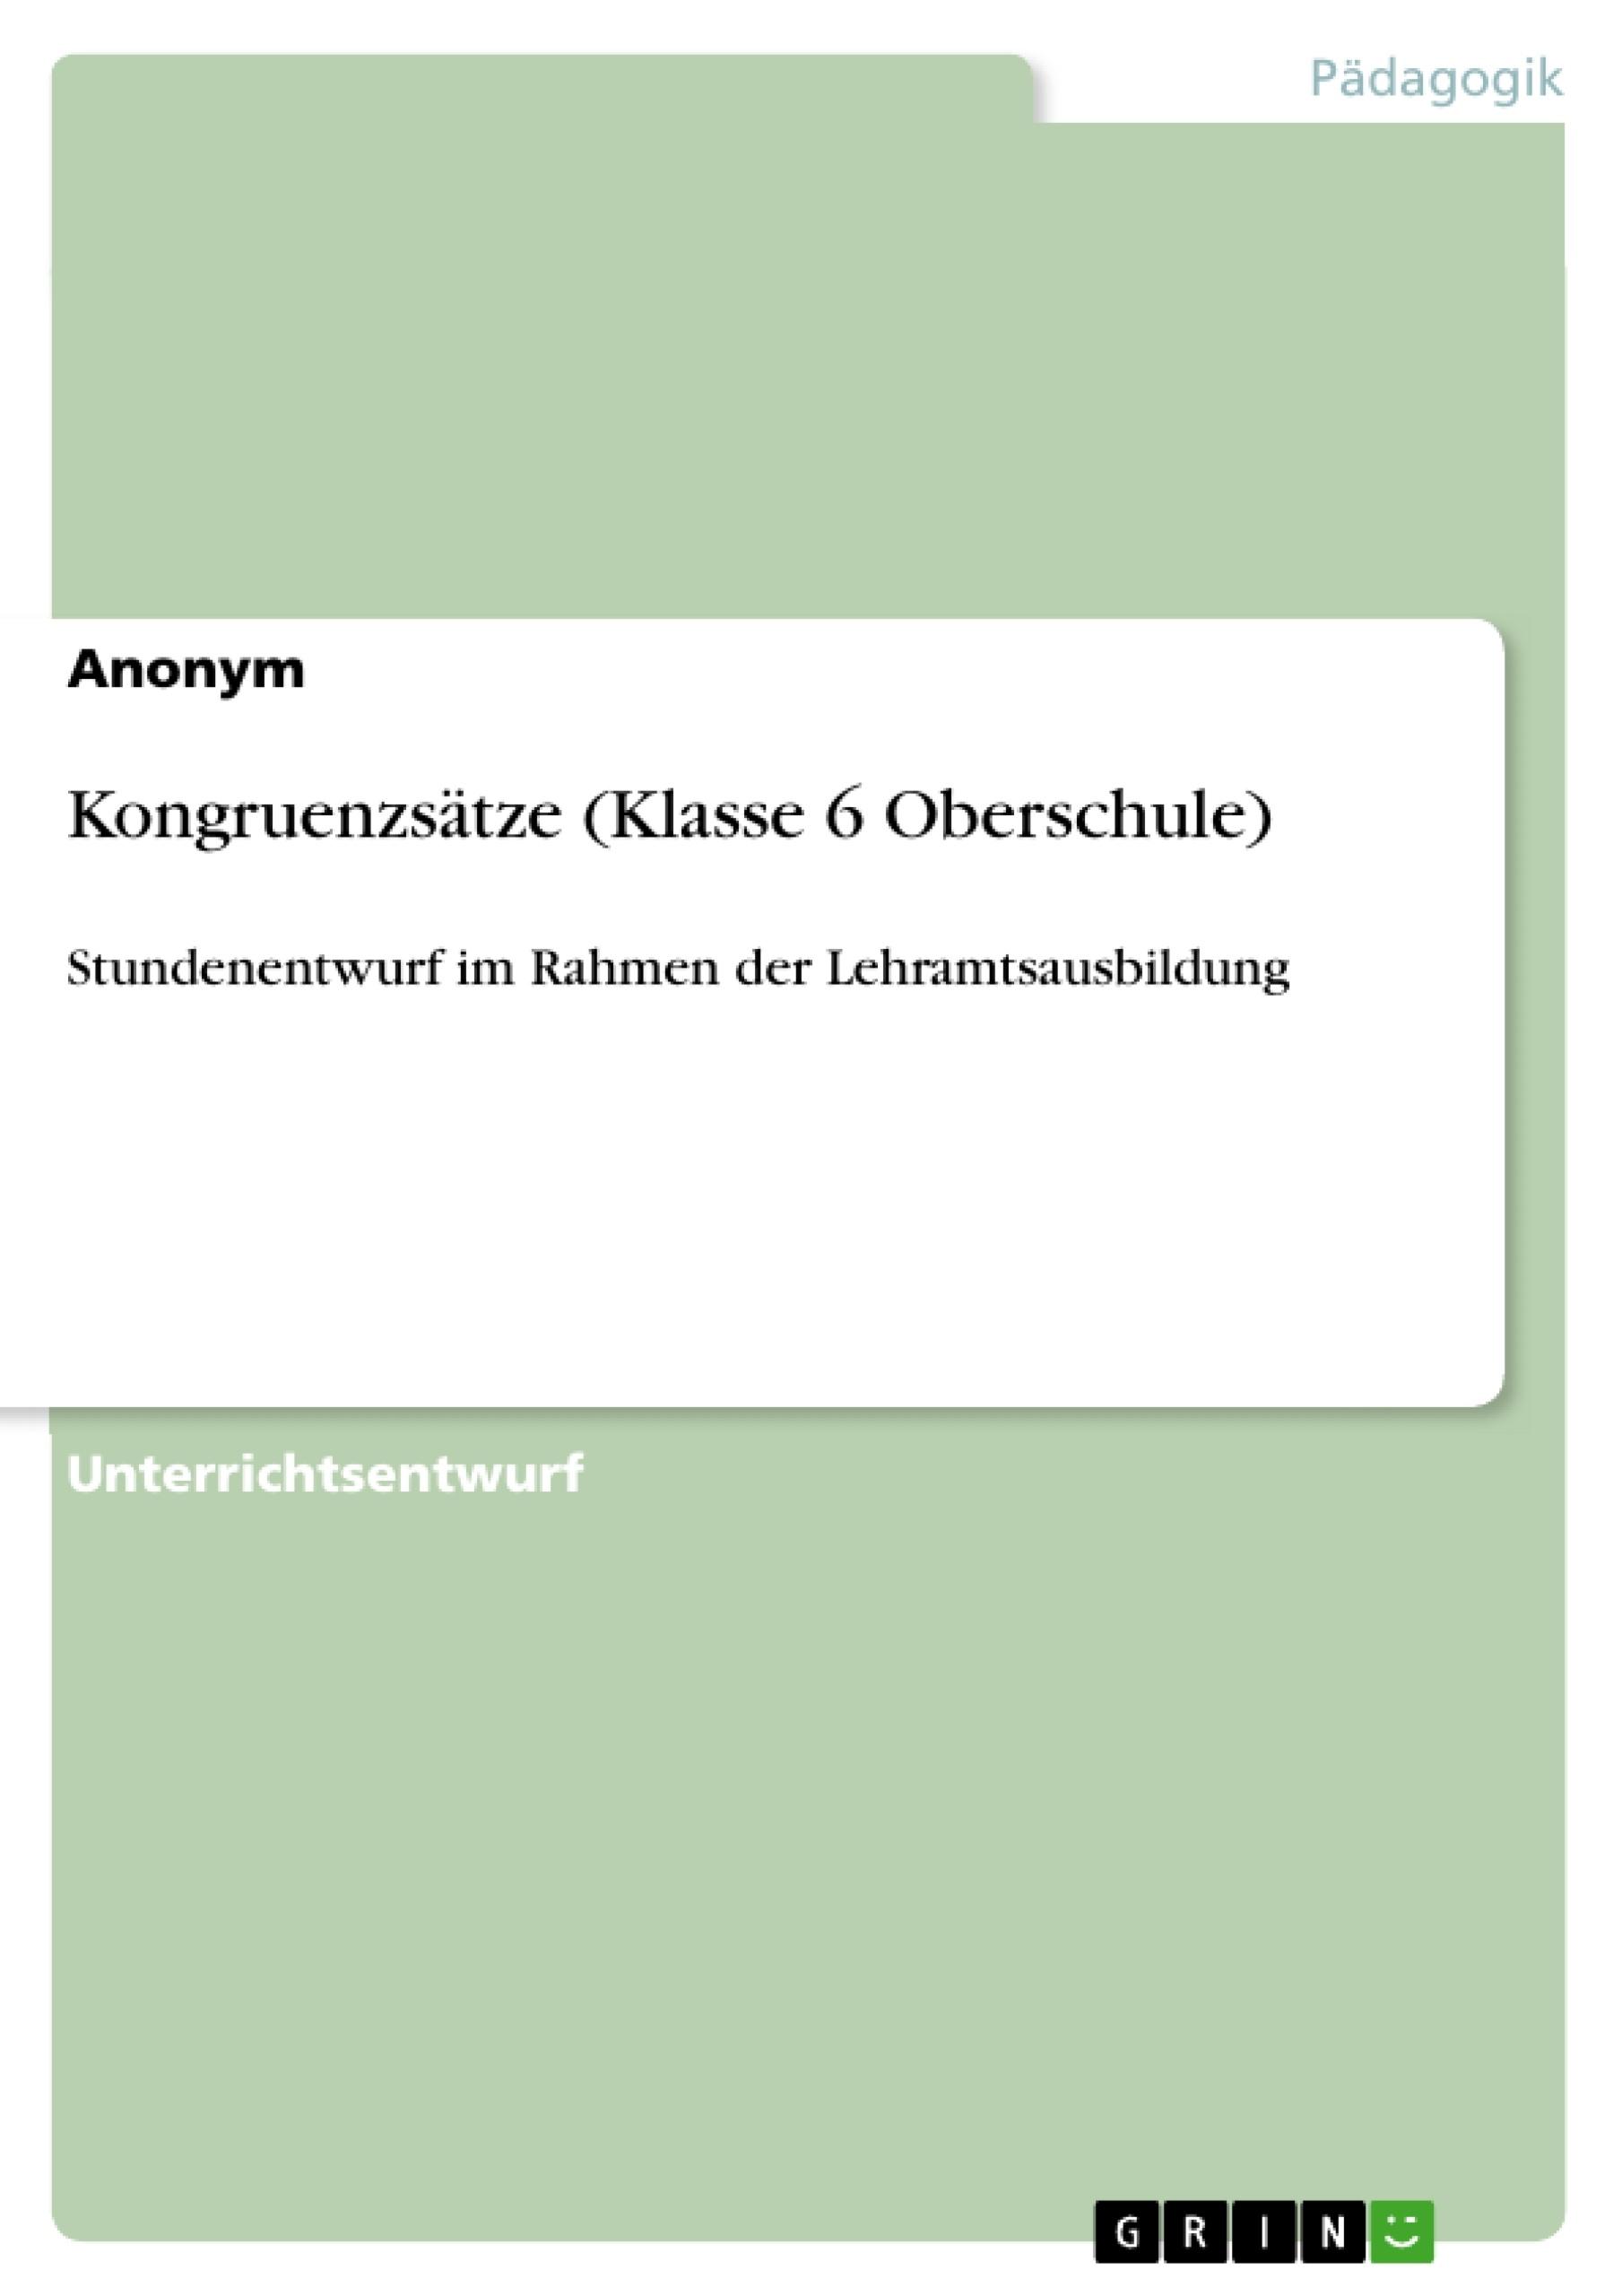 Titel: Kongruenzsätze (Klasse 6 Oberschule)